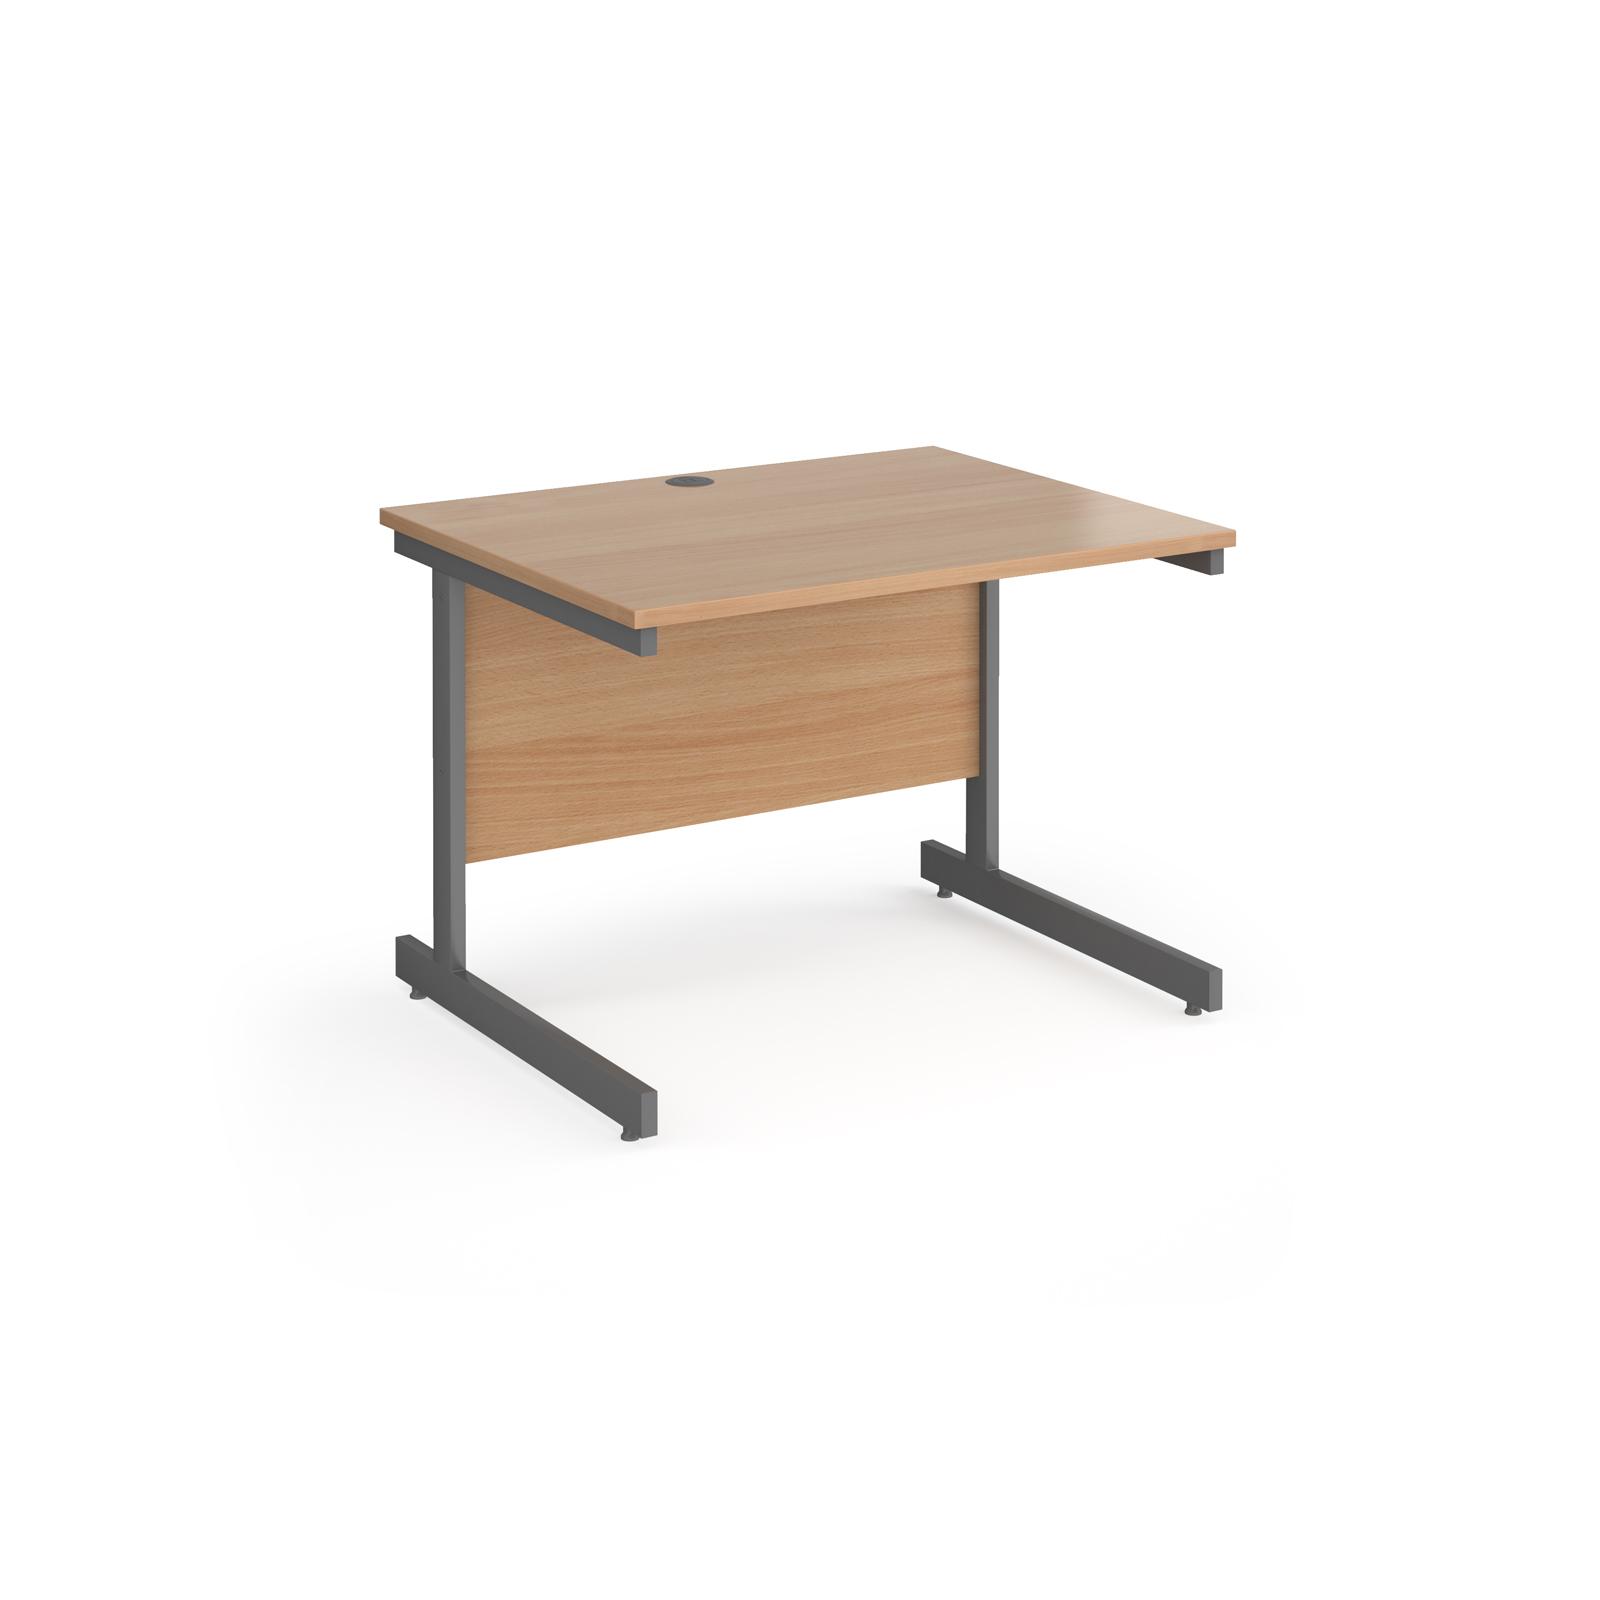 Rectangular Desks Contract 25 cantilever leg straight desk